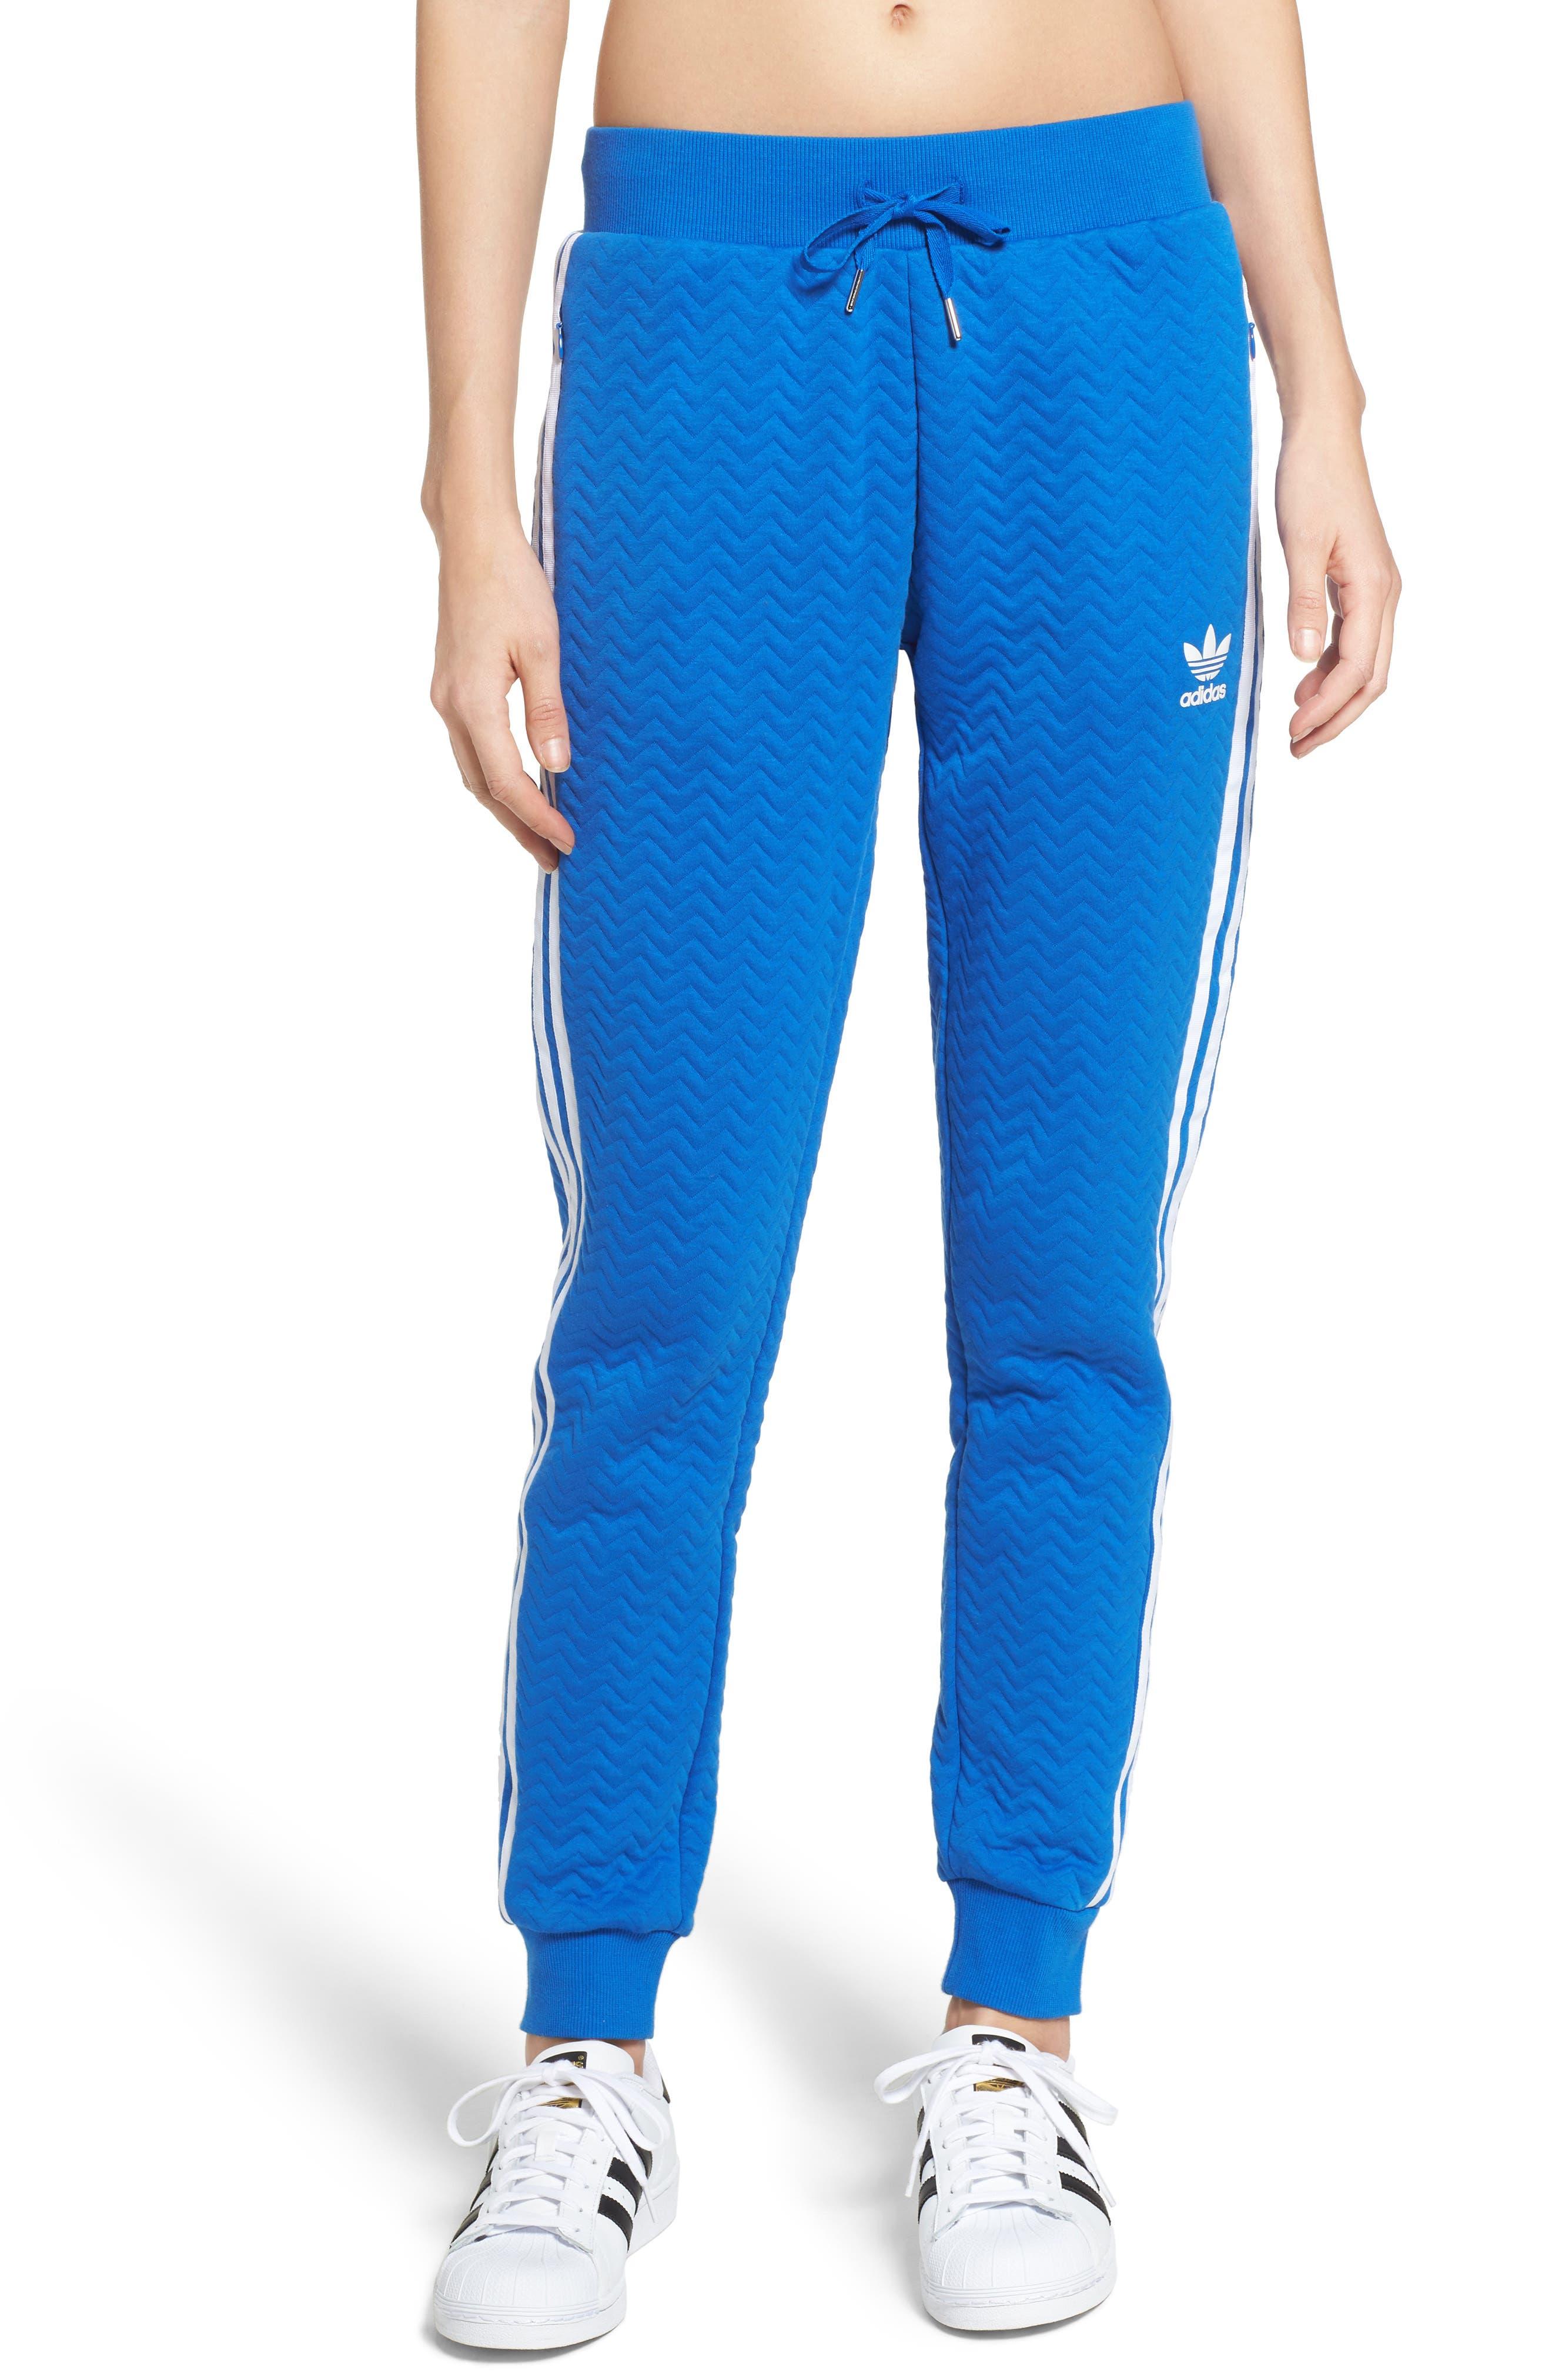 Alternate Image 1 Selected - adidas Originals Track Pants